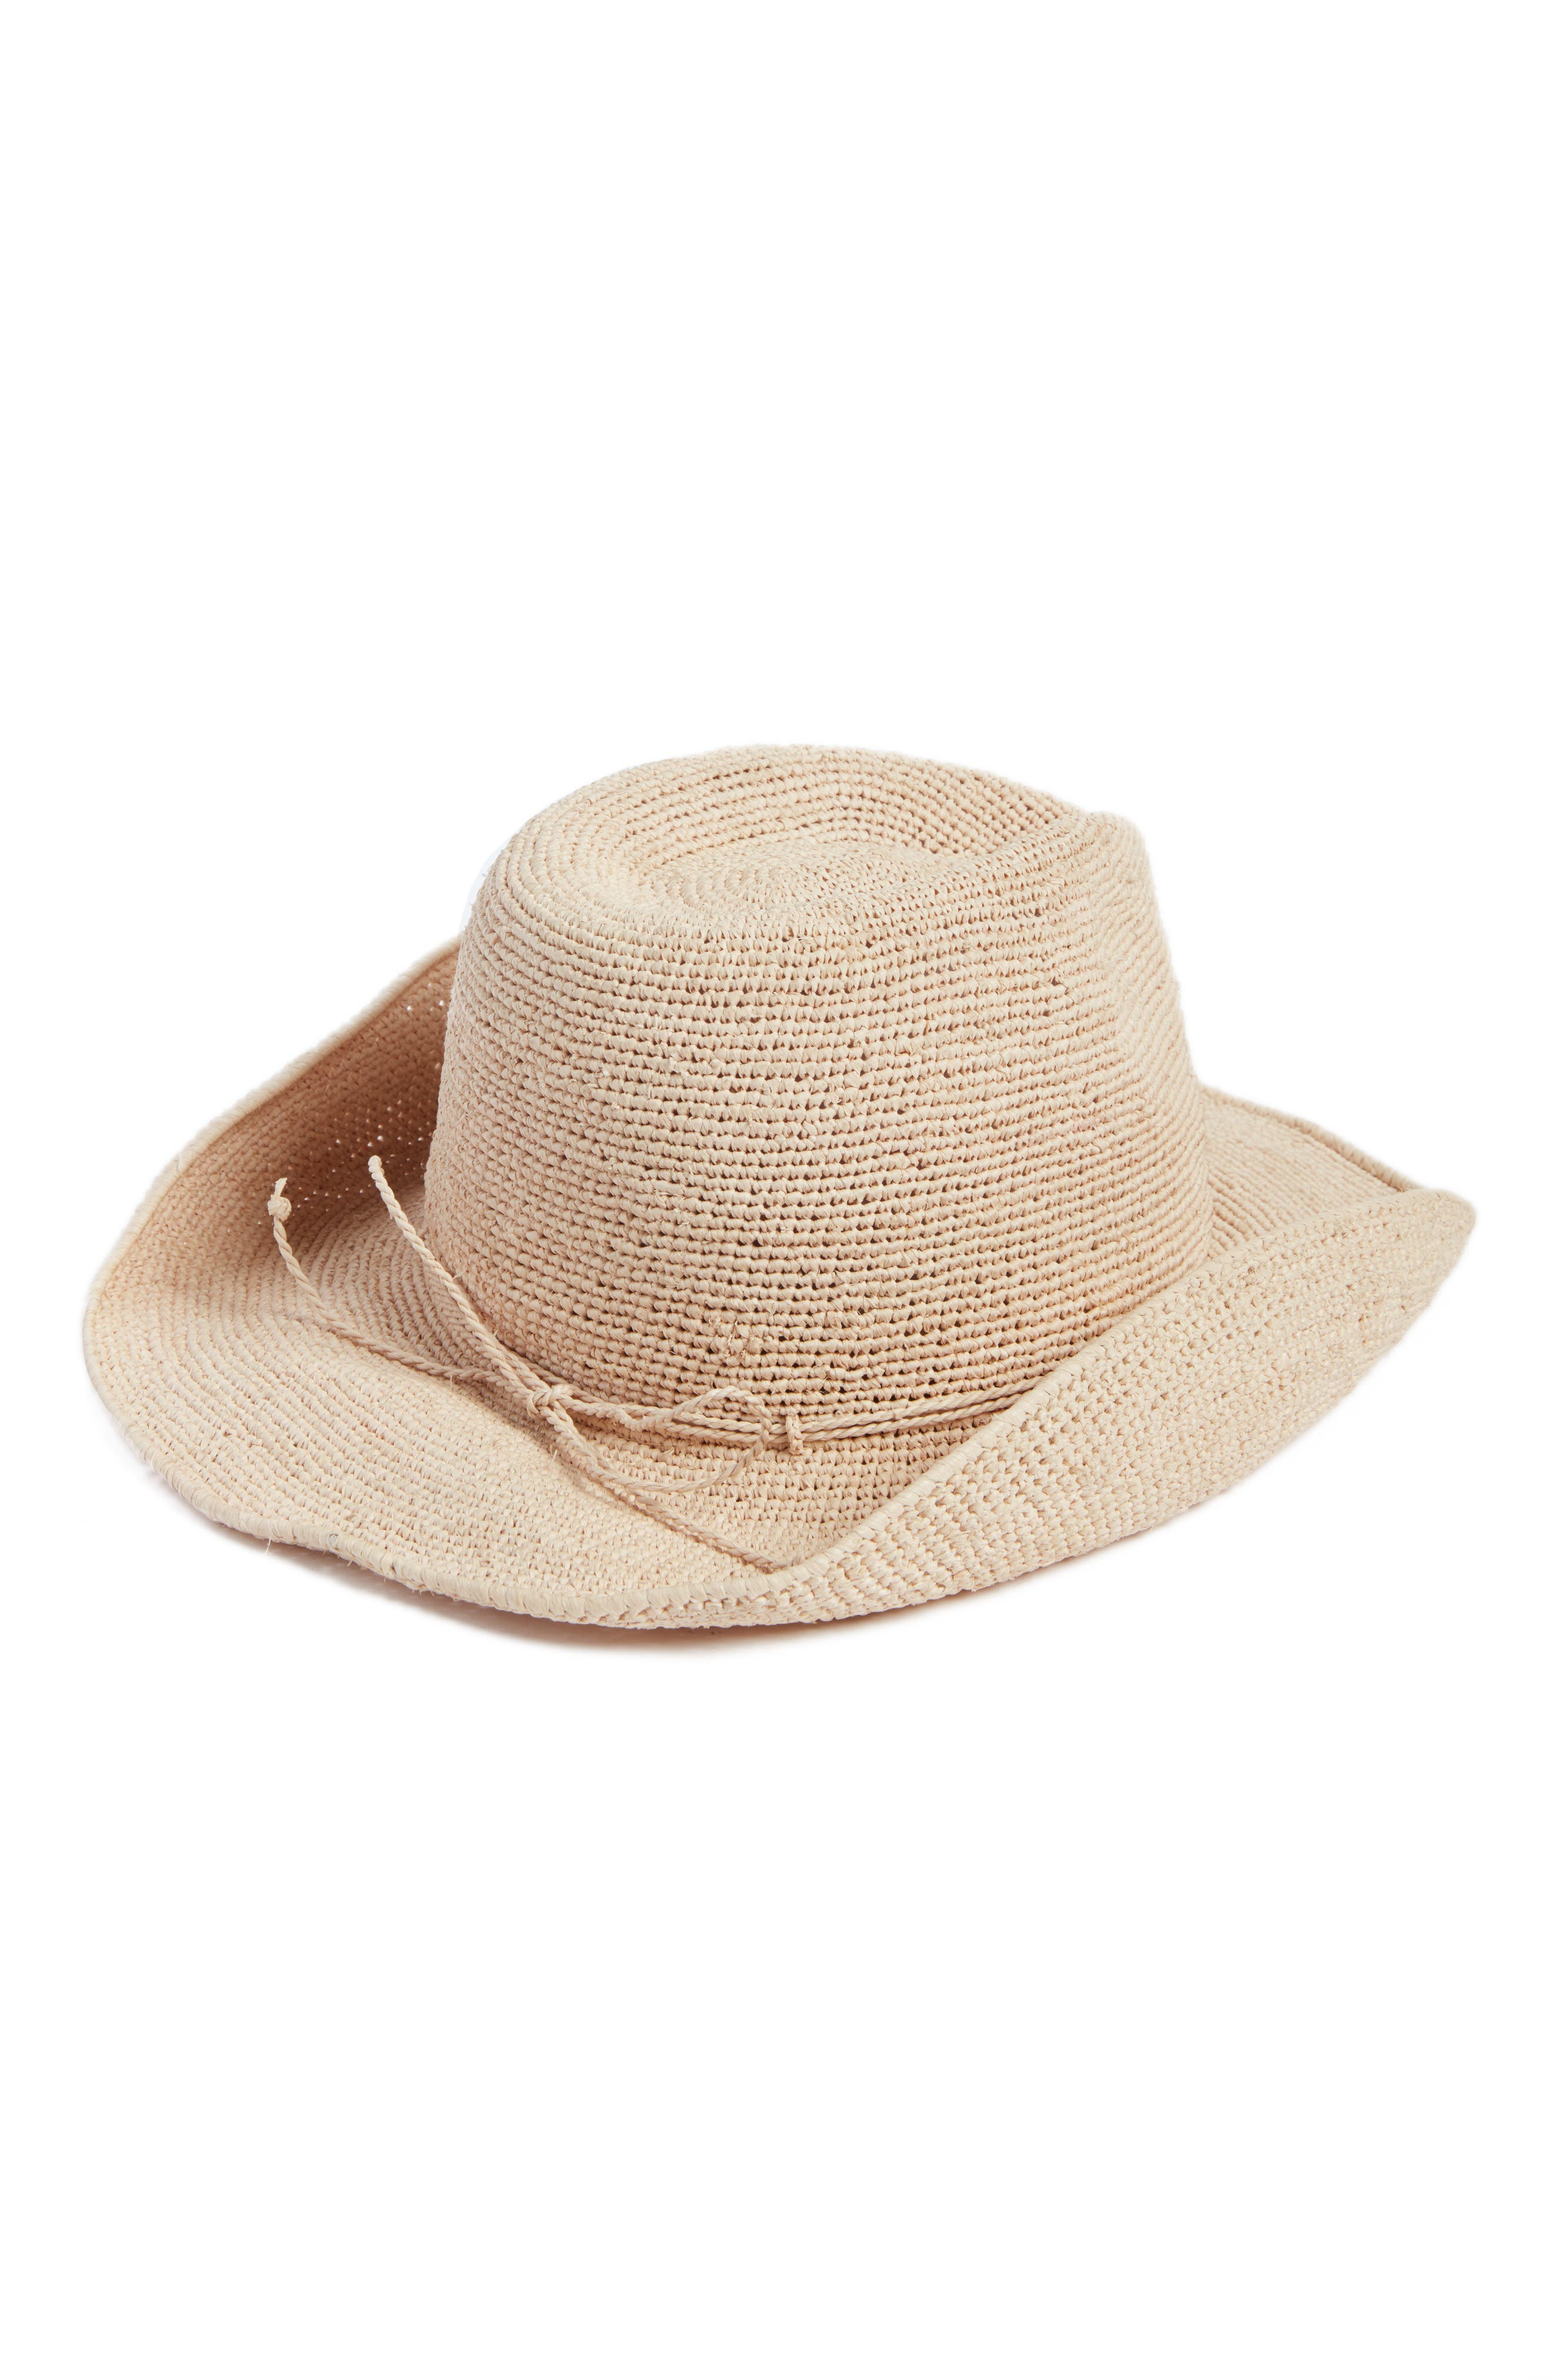 Belen Western Hat,                             Alternate thumbnail 2, color,                             NATURAL